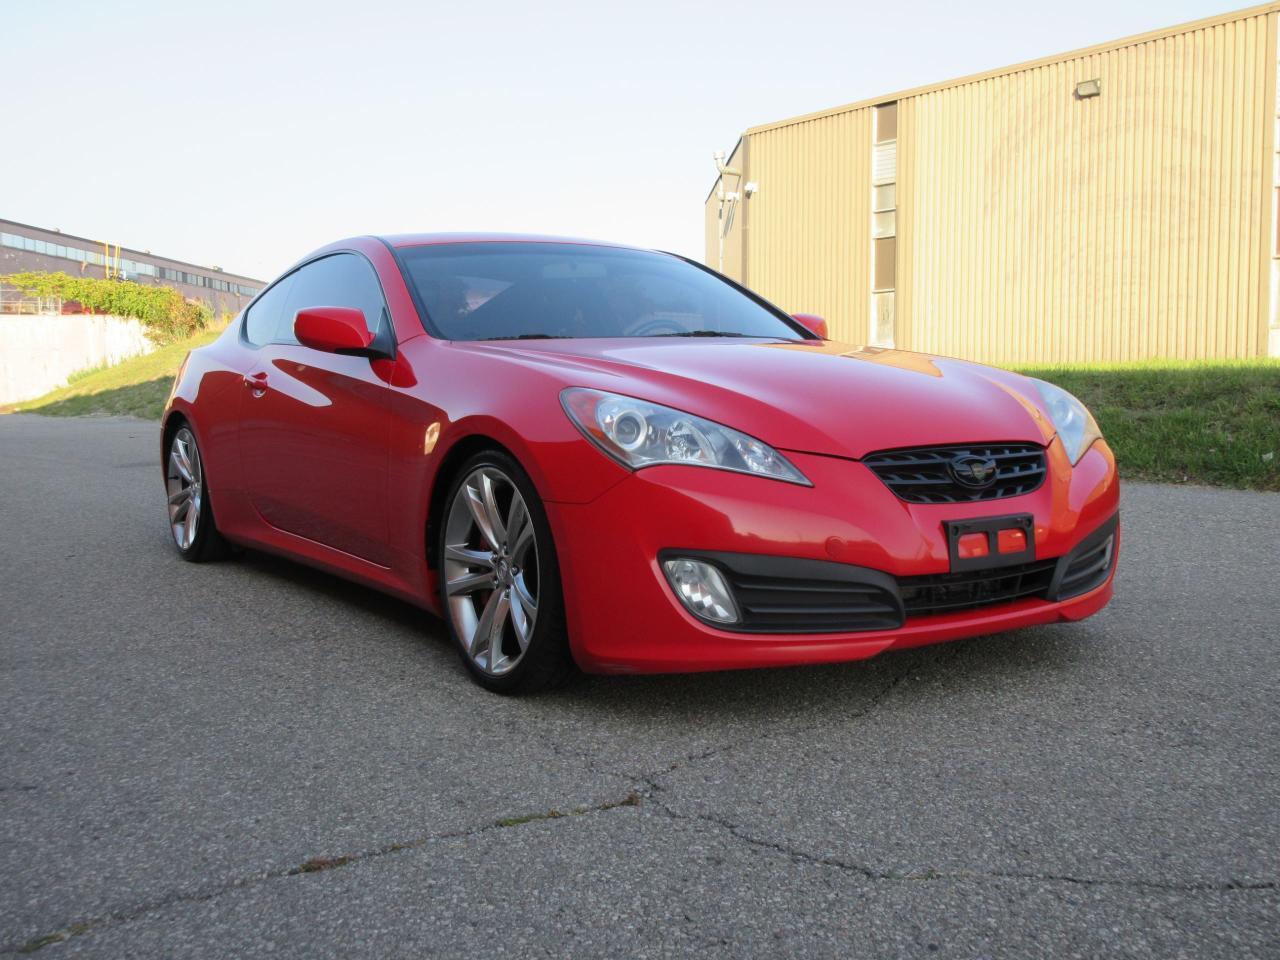 2010 Hyundai Genesis Coupe 2.0 LITRE, PREMIUM, LEATHER,